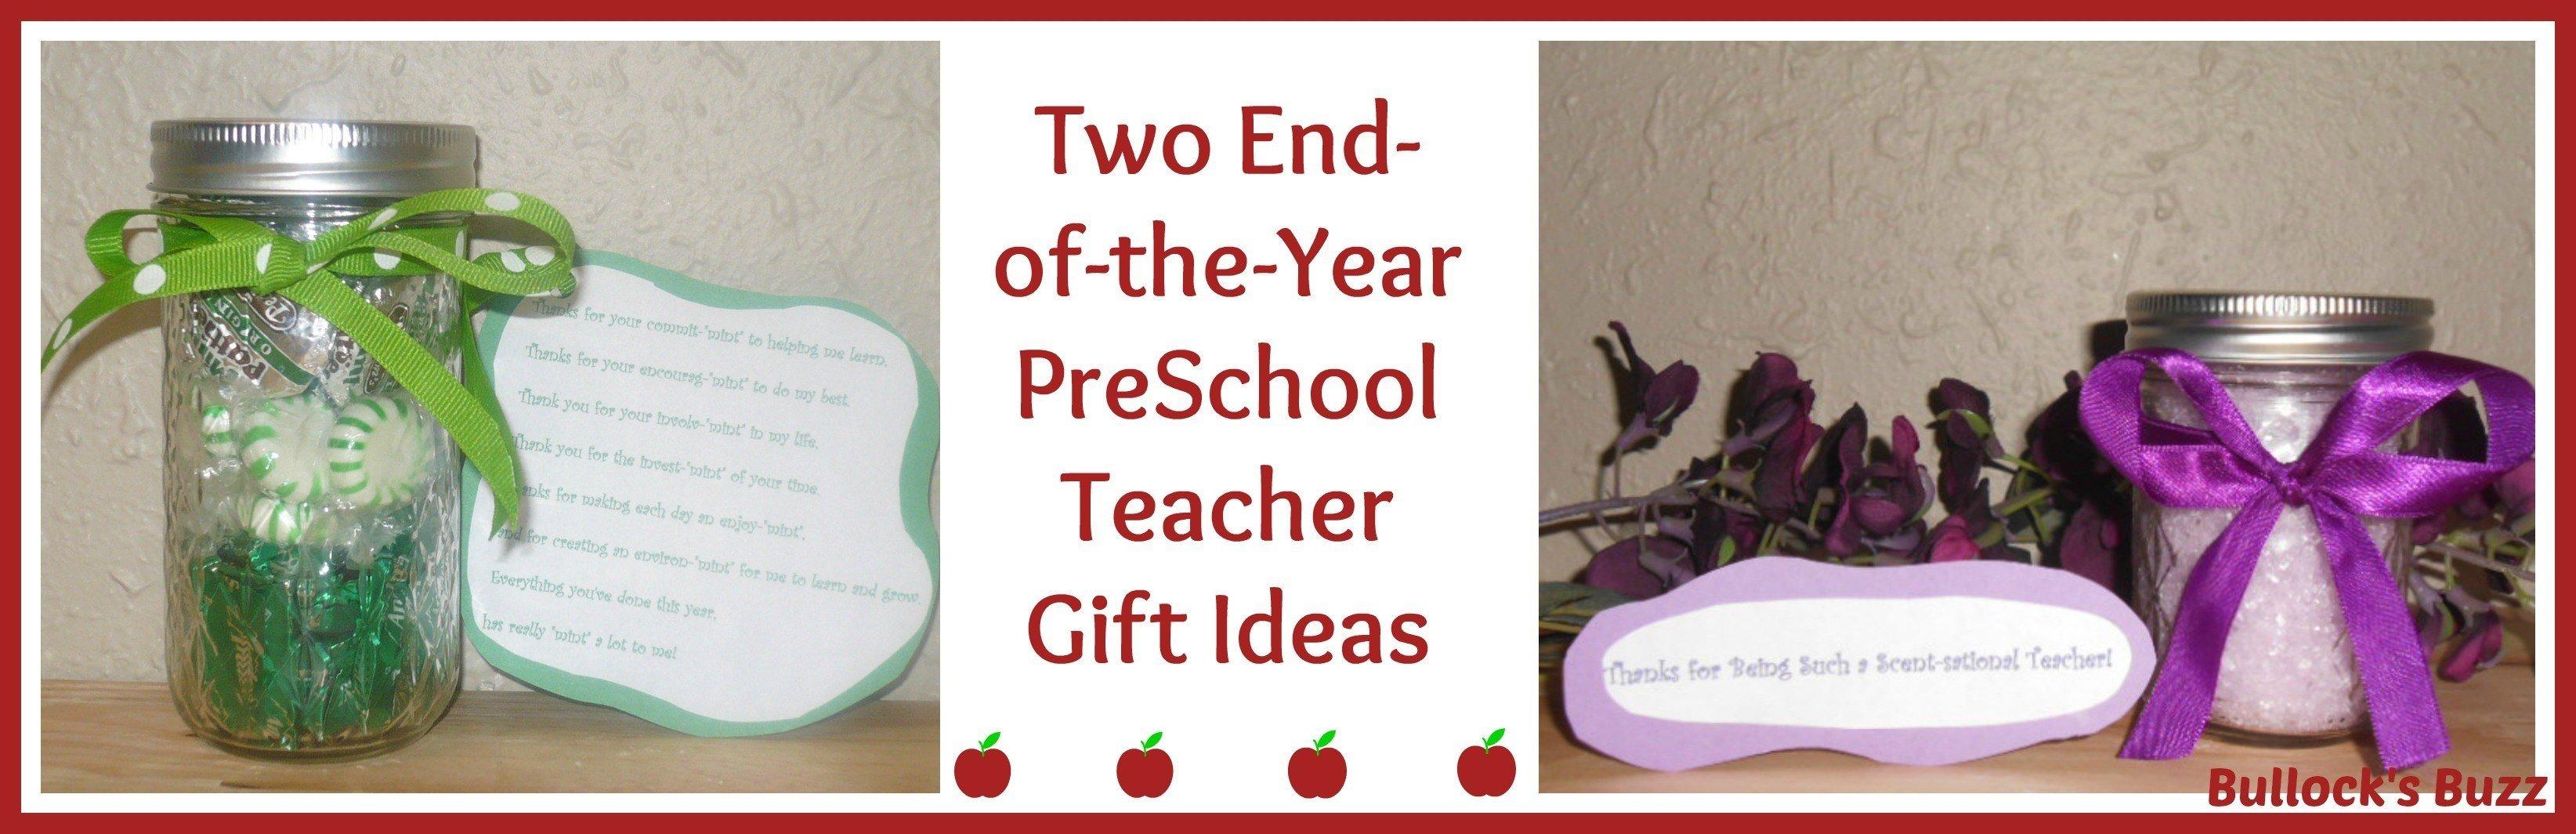 two end-of-the-year preschool teacher gift ideas